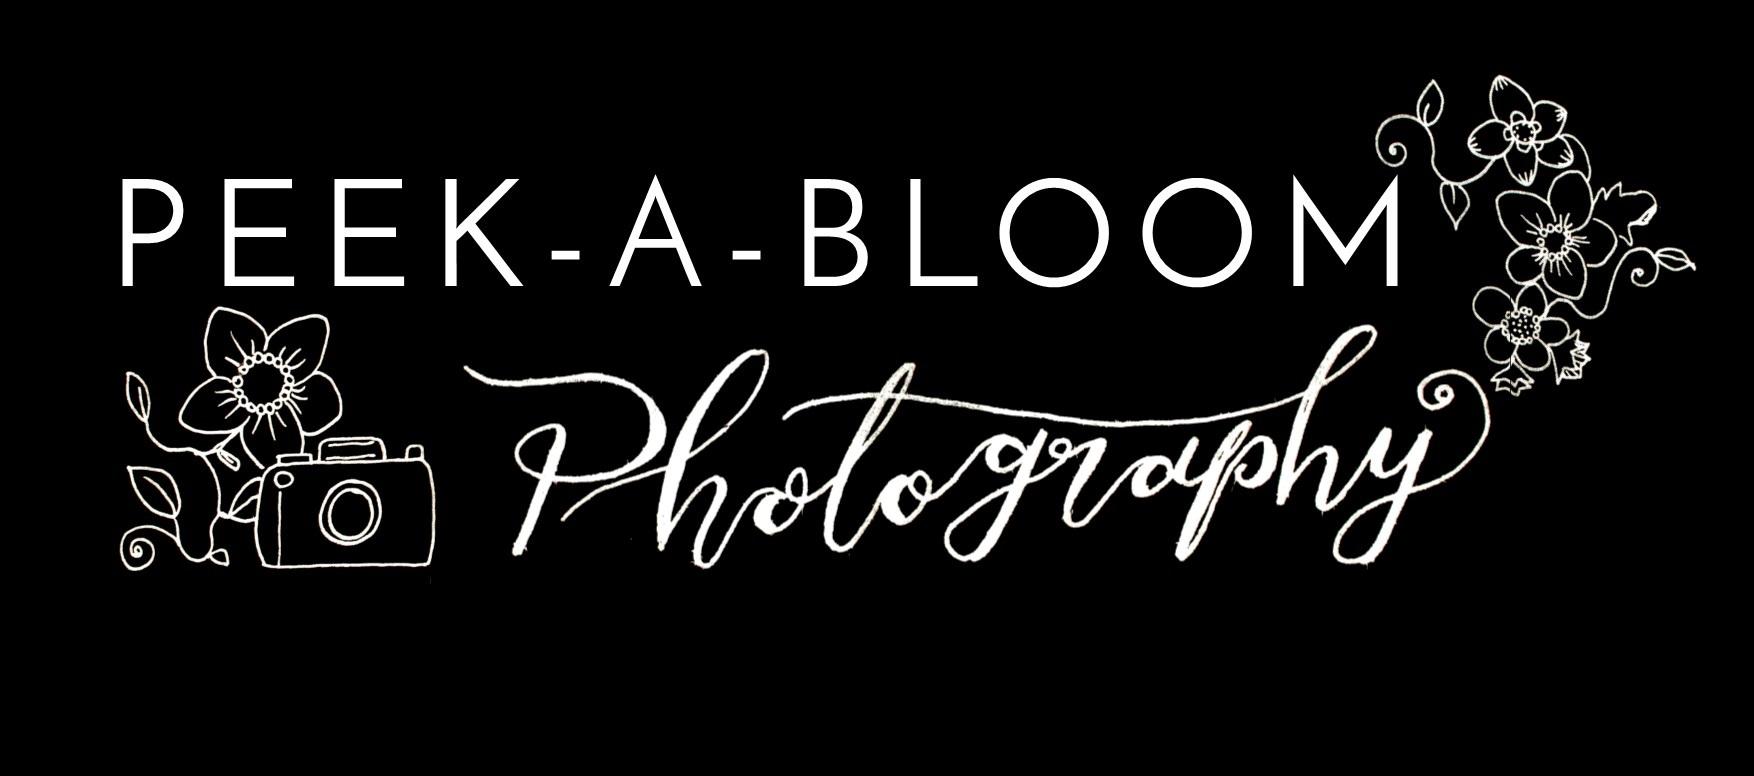 Peek a bloom photography